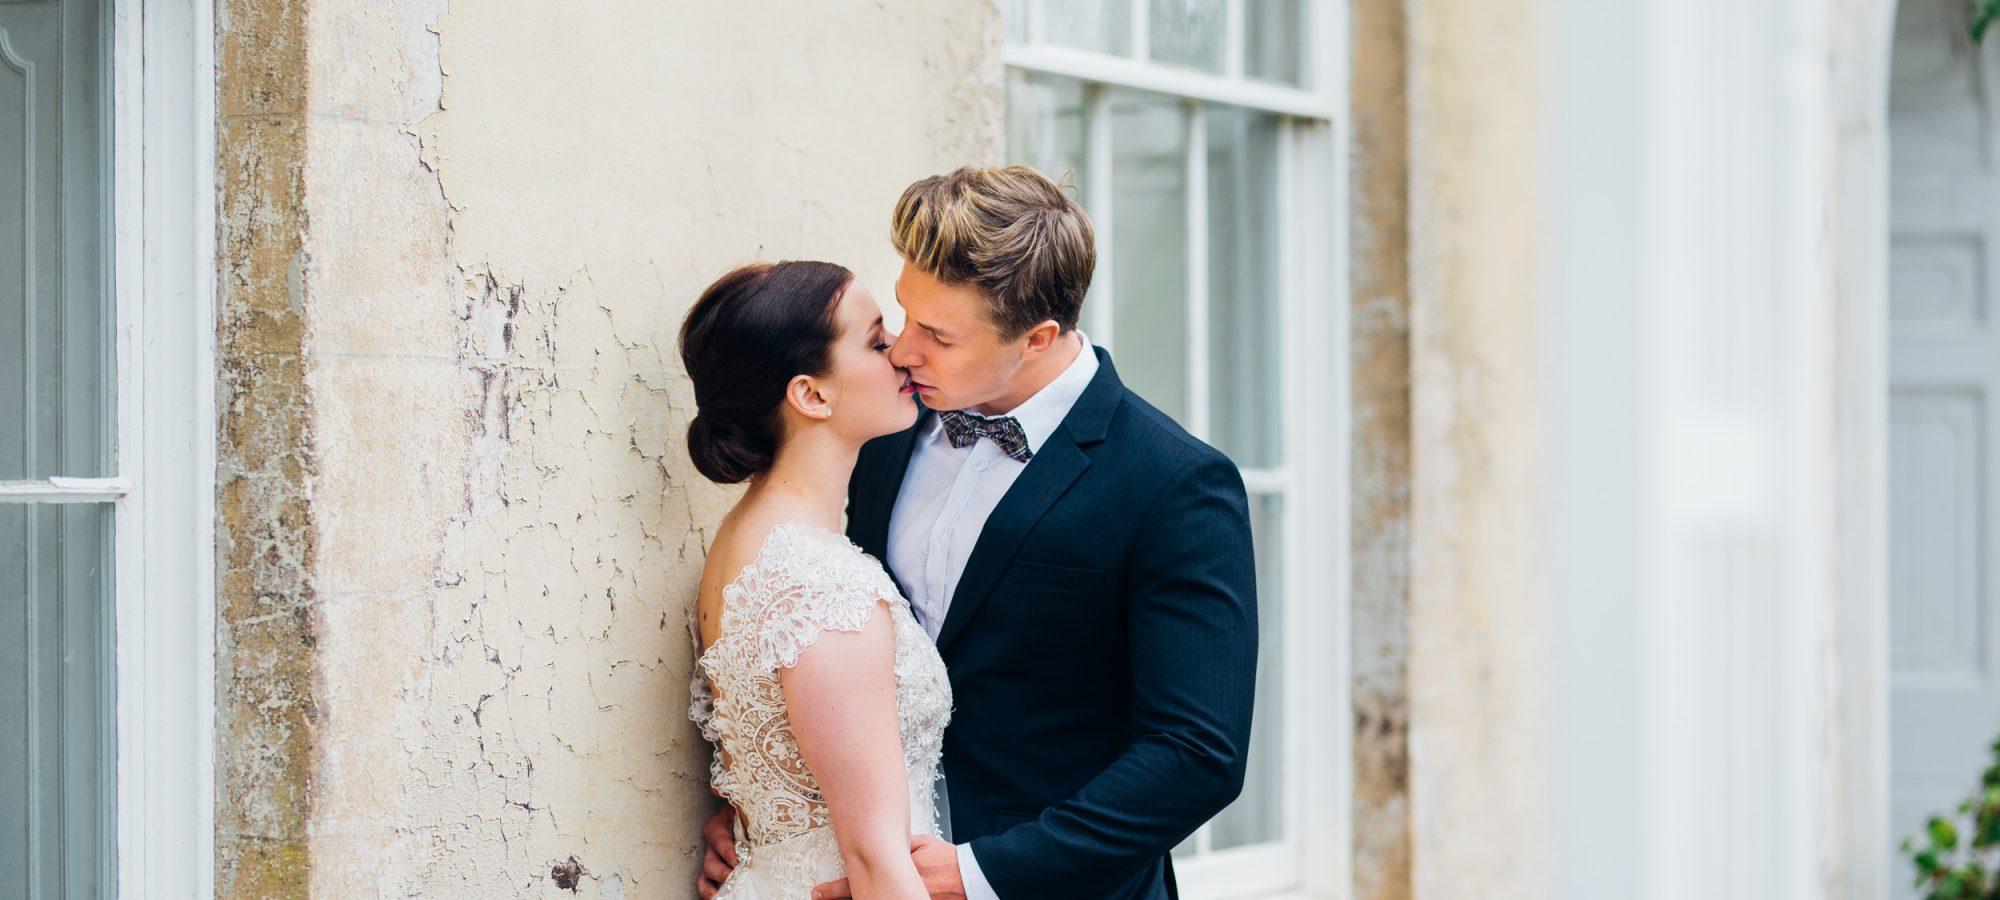 2 Ebba Fredrik Louise Alexander-Martina-Lundborg-Fotograf-1